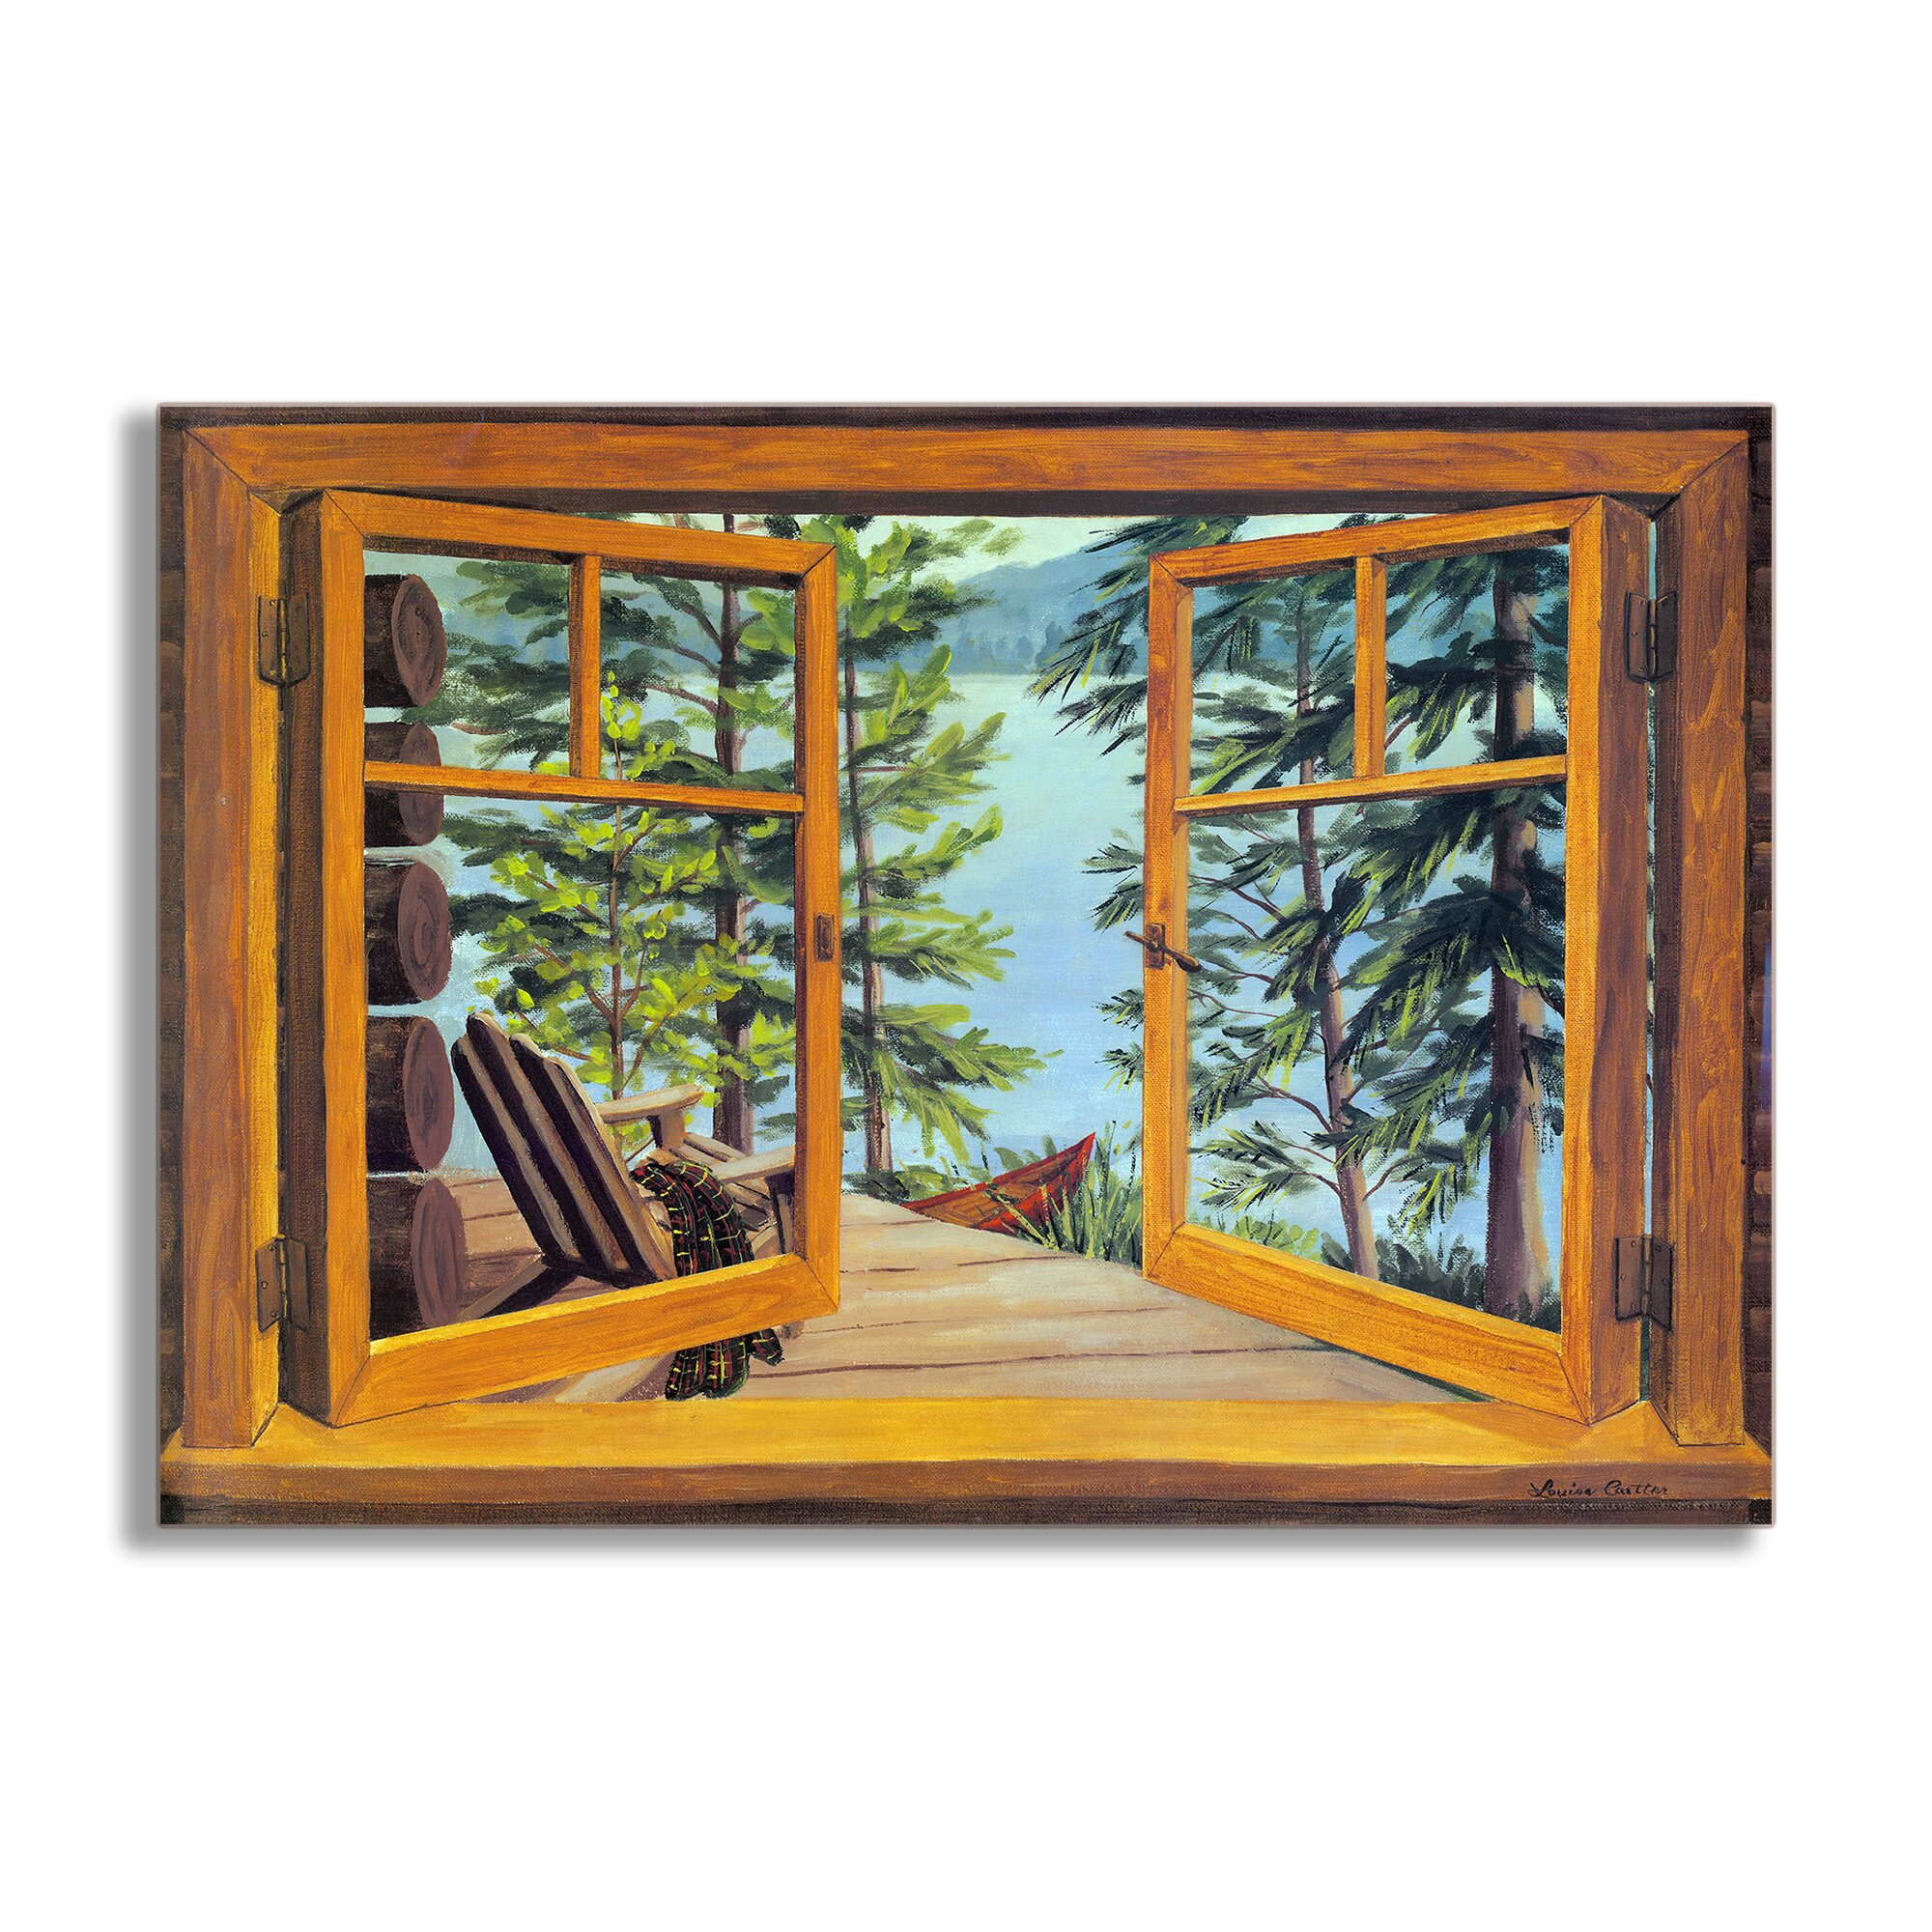 Painting A Scene Through Window Glass